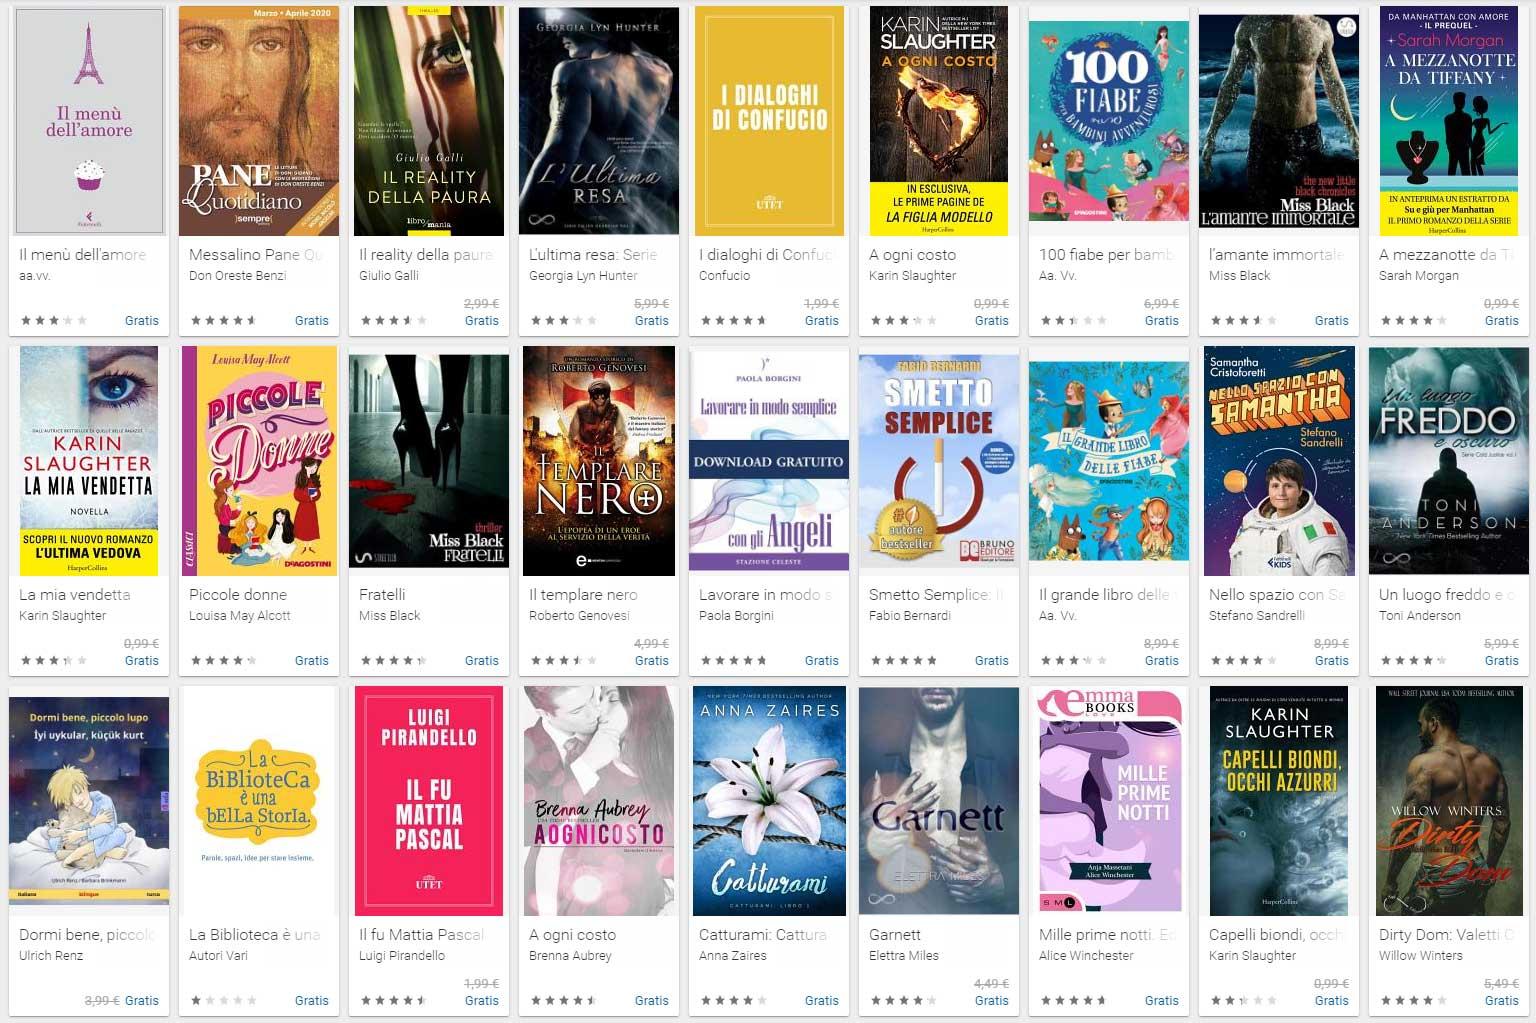 Ebook gratis, ecco come leggere dei libri gratuitamente da casa (LEGALMENTE)